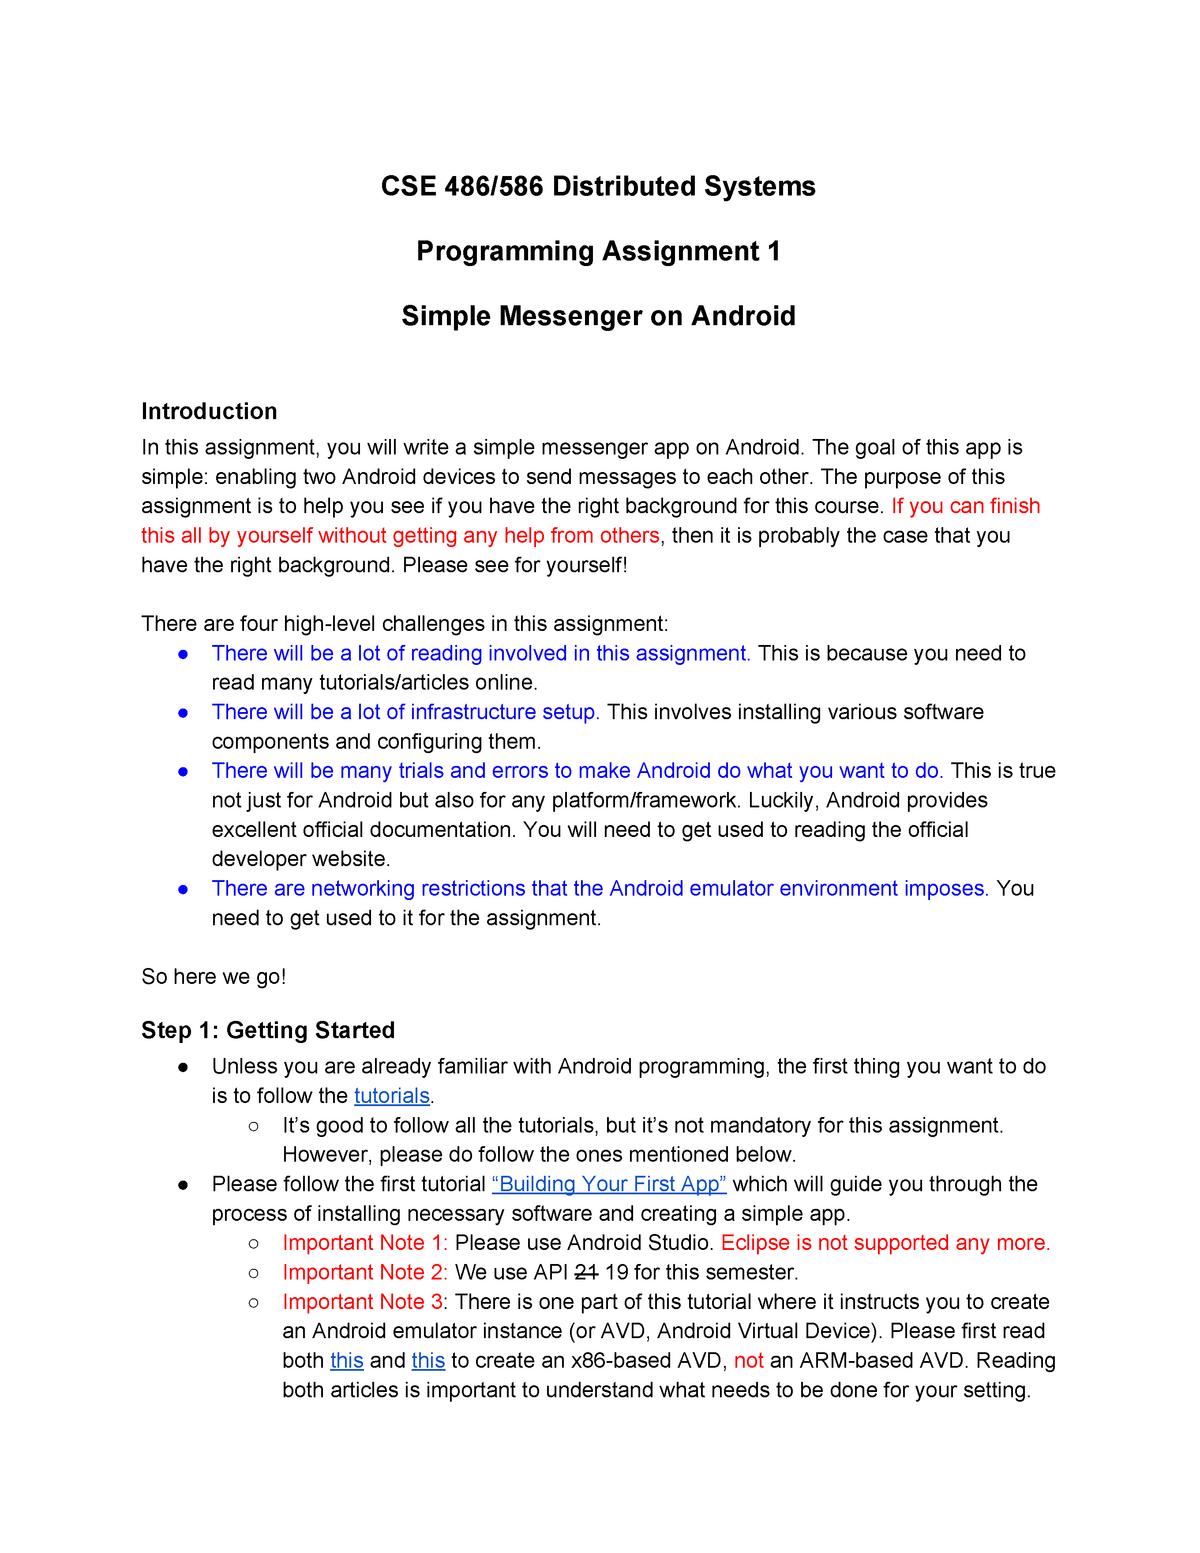 Programming assignments 1, 2A, 2B, 3 & 4 - CSE 486 - UB